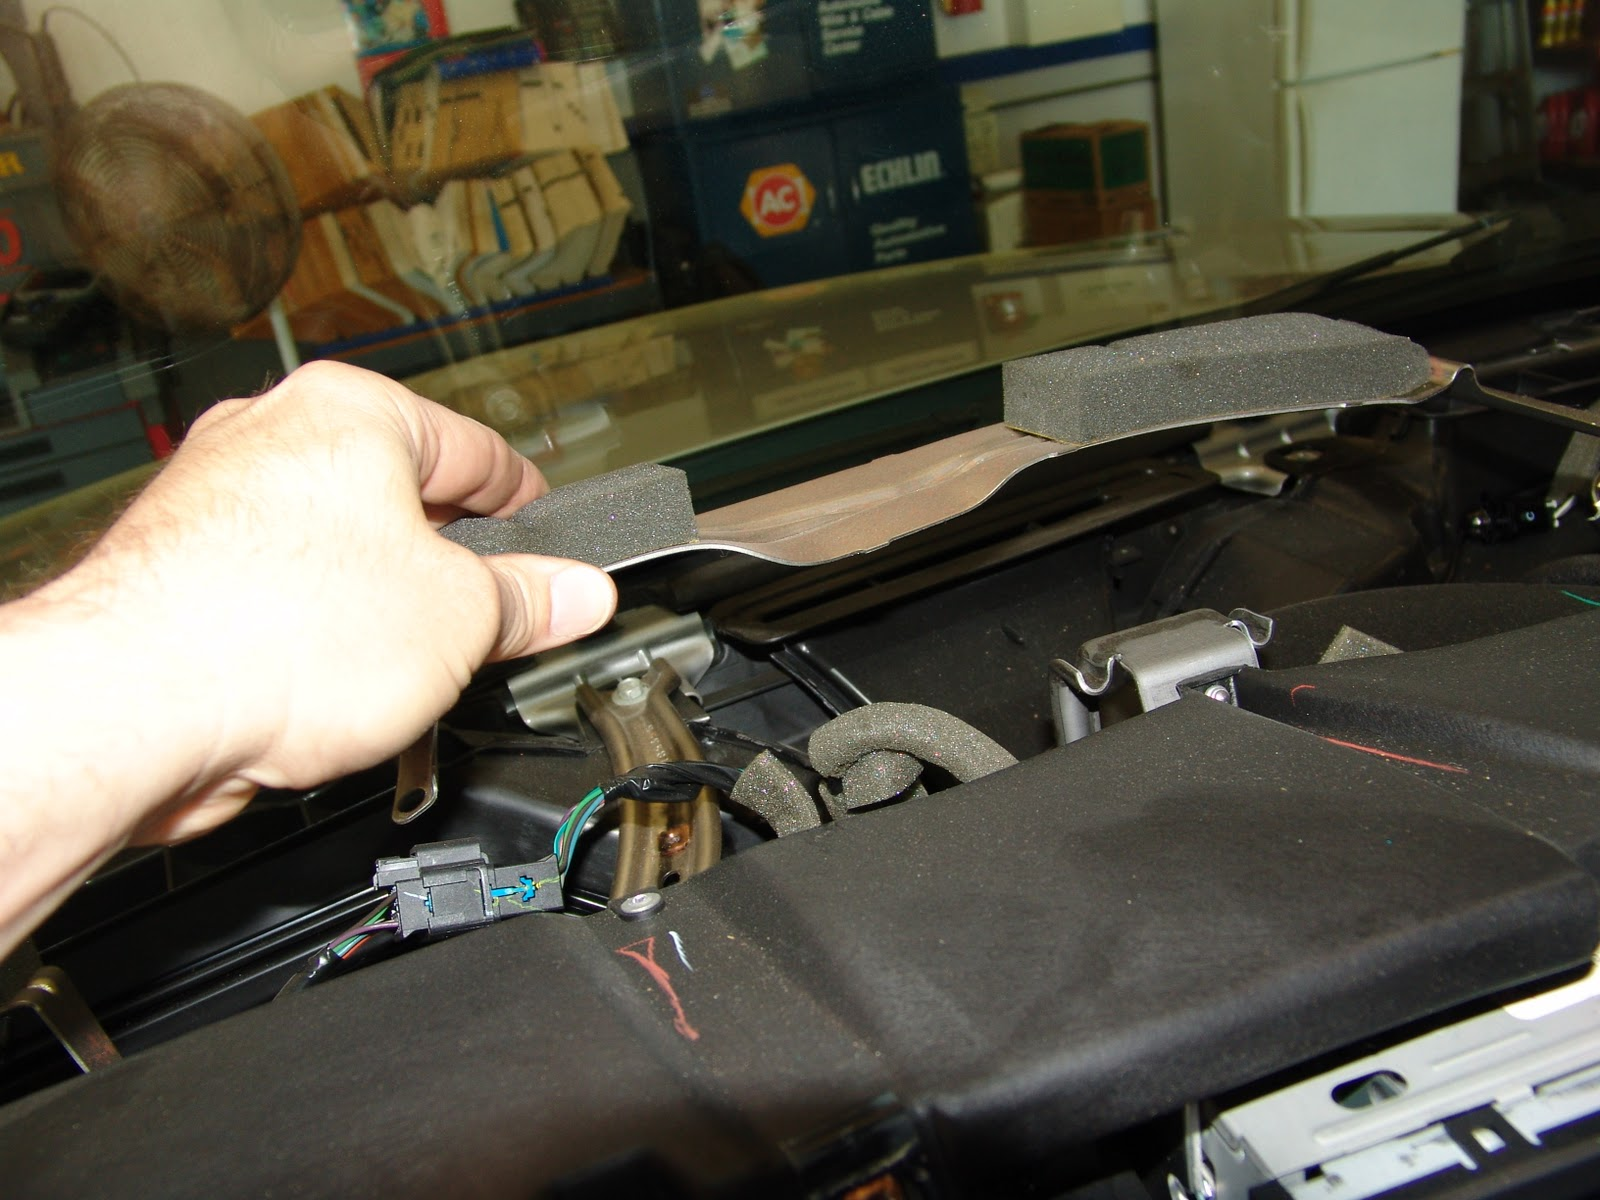 2006 Dodge Dakota Bumper Diagram Auto Parts Diagrams